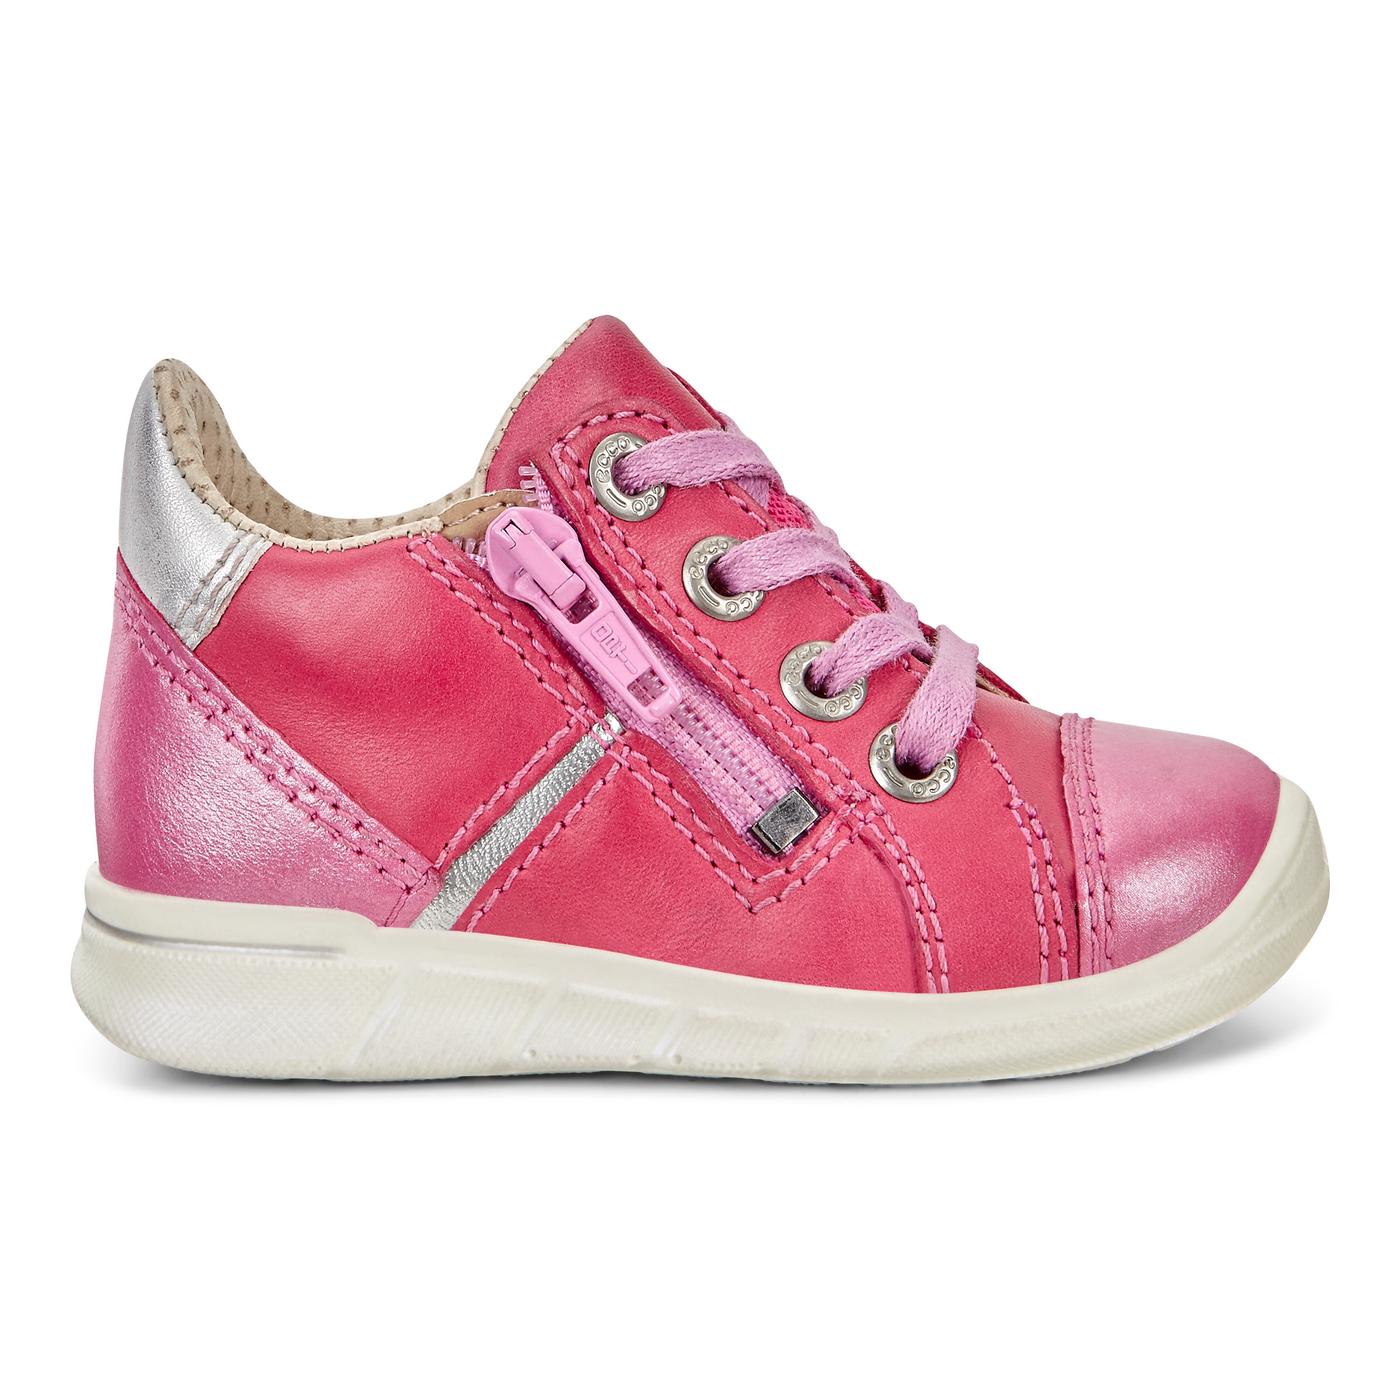 ECCO FIRST Shoe